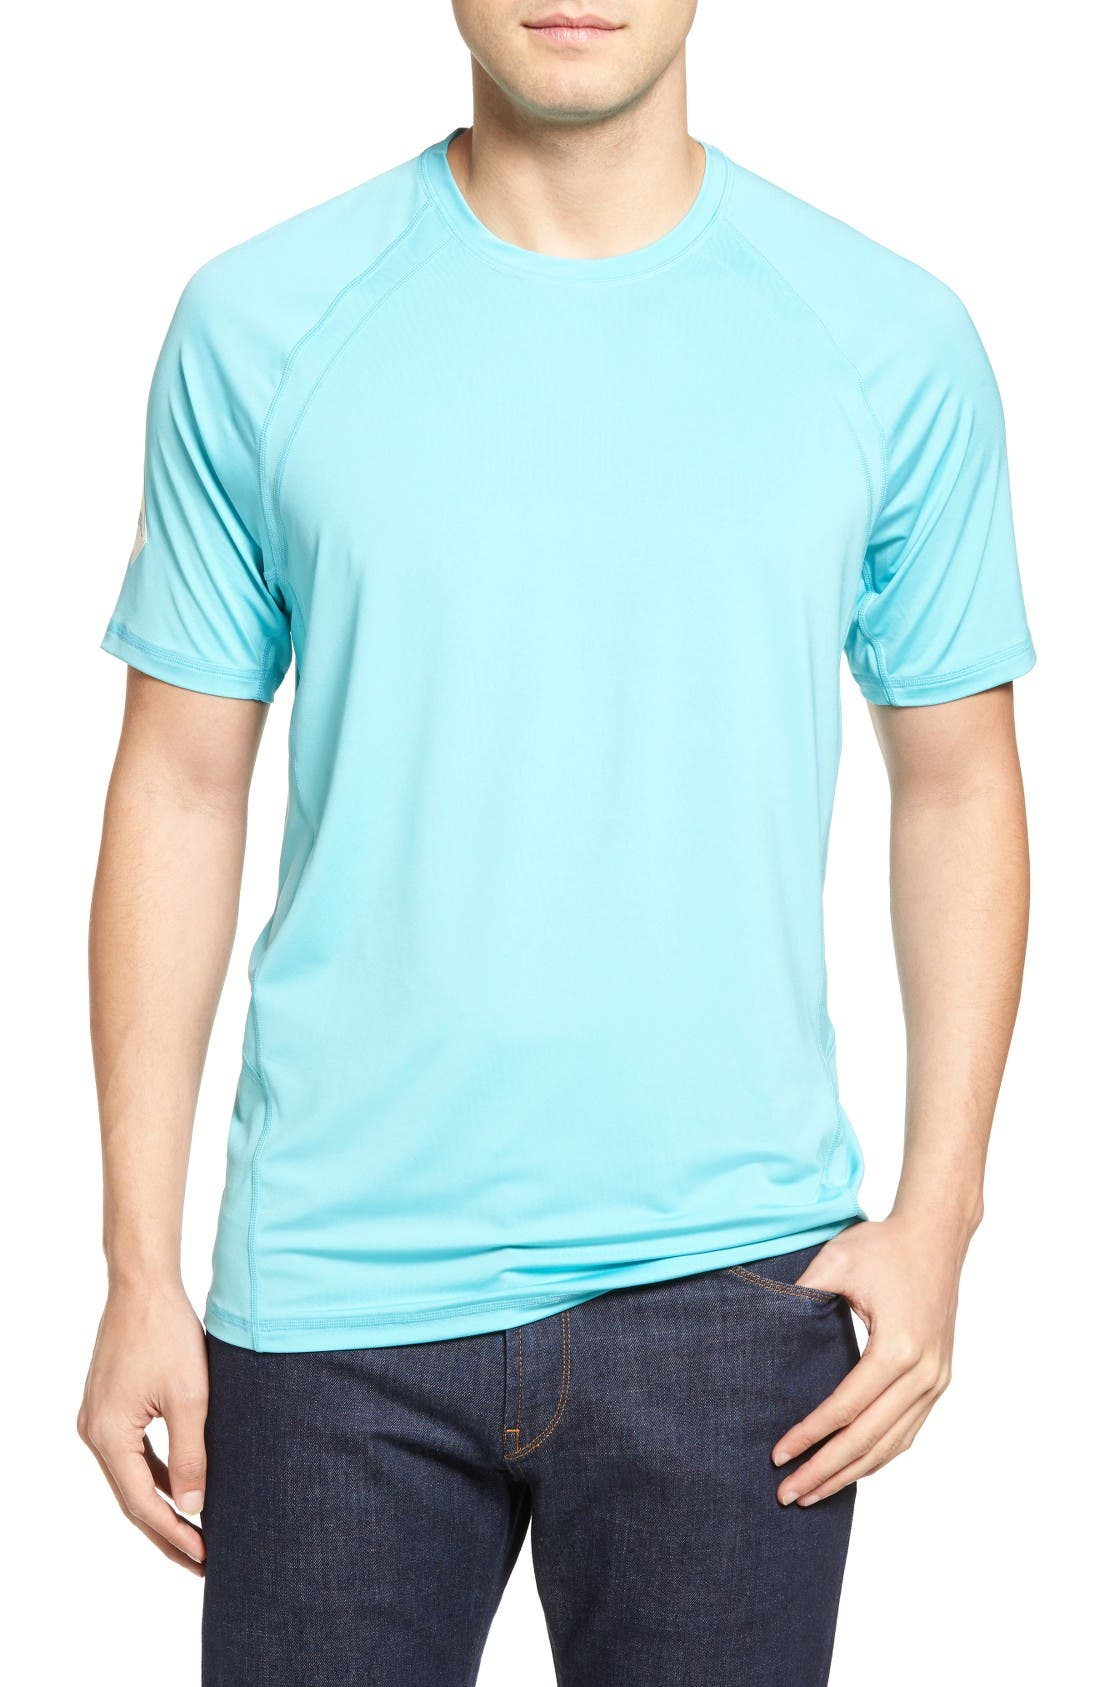 Surf Chaser Crewneck T-Shirt,                             Main thumbnail 1, color,                             Blue Radiance